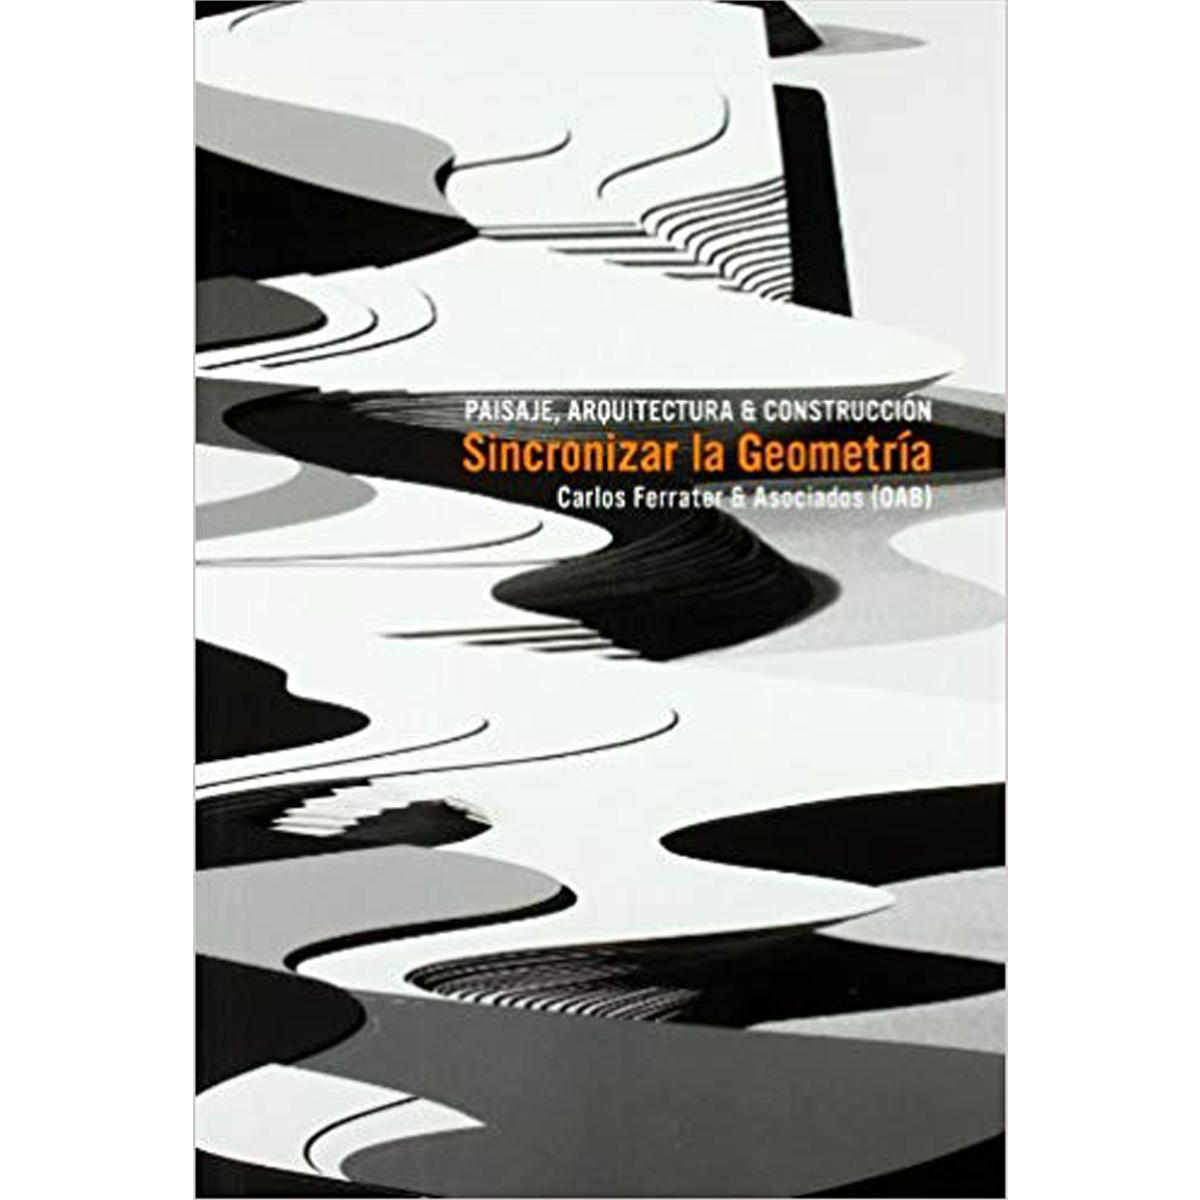 Sincronizar la geometría